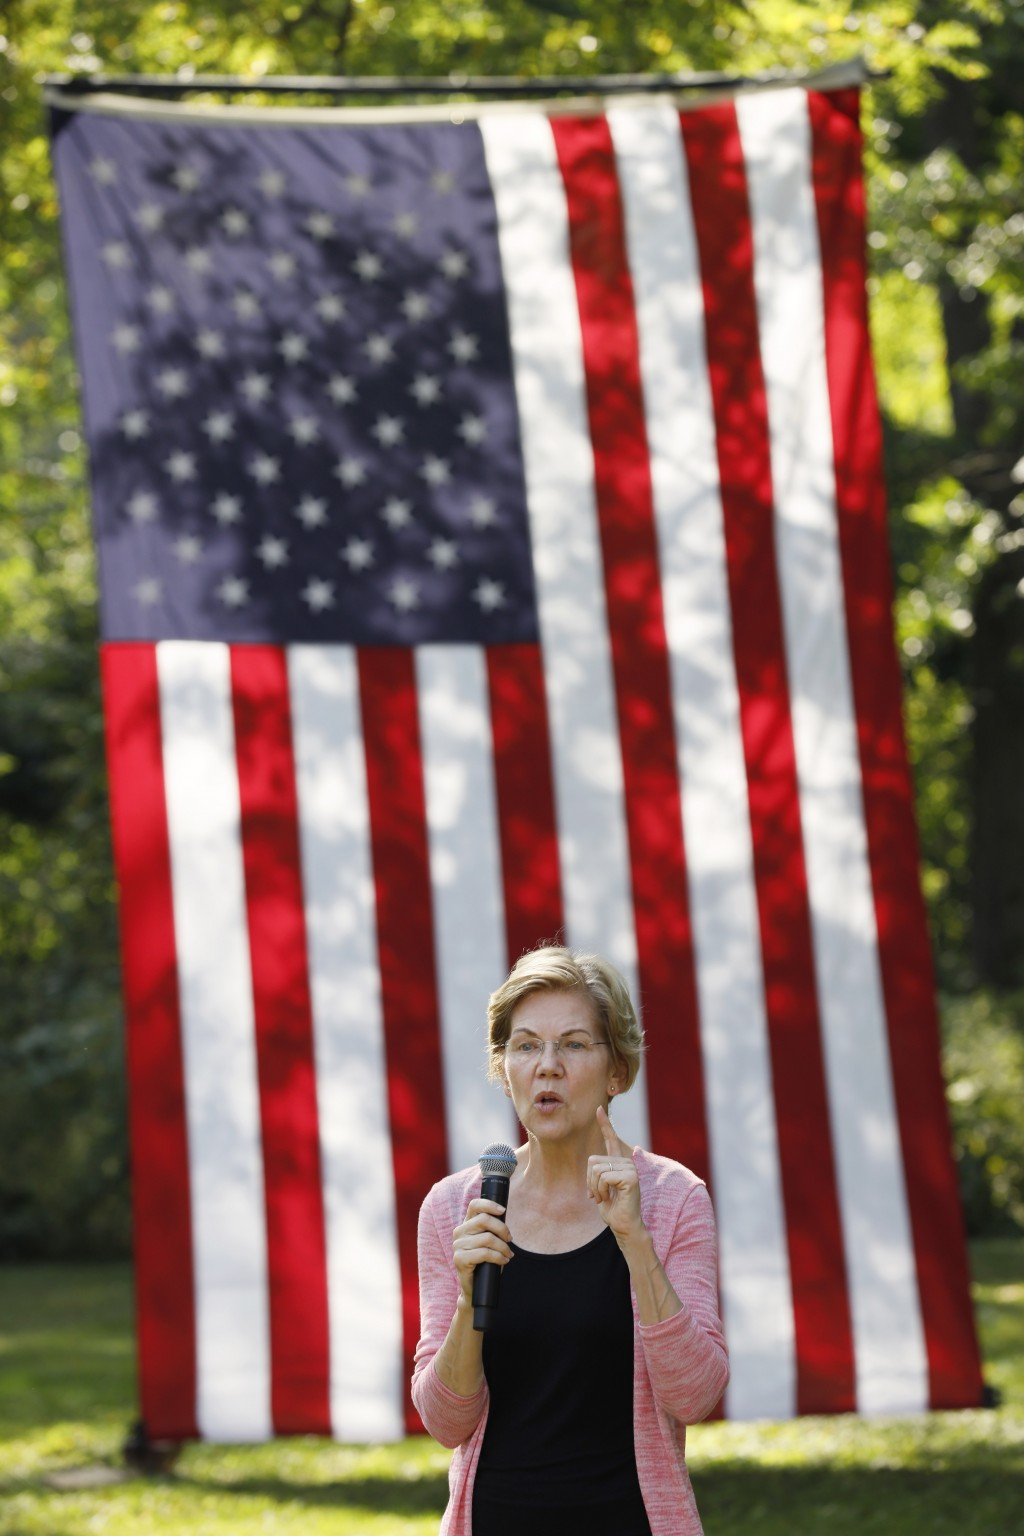 Democratic presidential candidate Sen. Elizabeth Warren speaks during a house party, Friday, Sept. 20, 2019, in Mount Vernon, Iowa. (AP Photo/Charlie